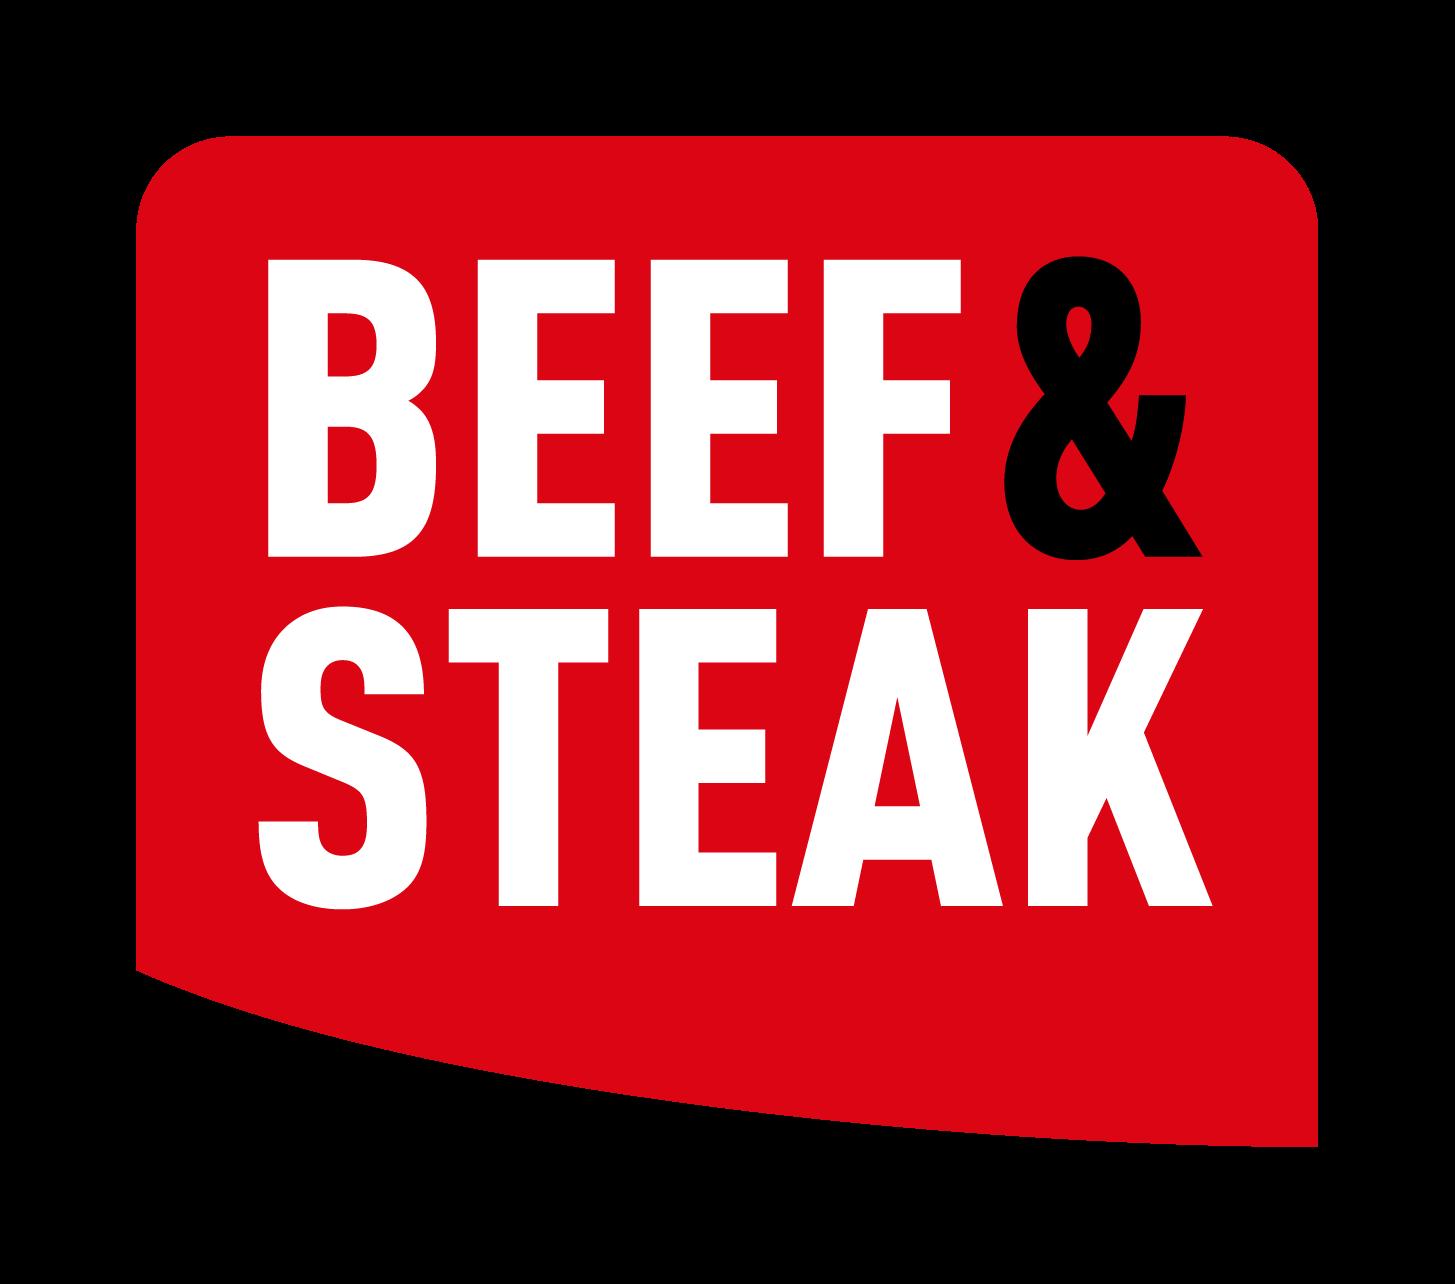 tournedos-steakpakket-chateaubriand